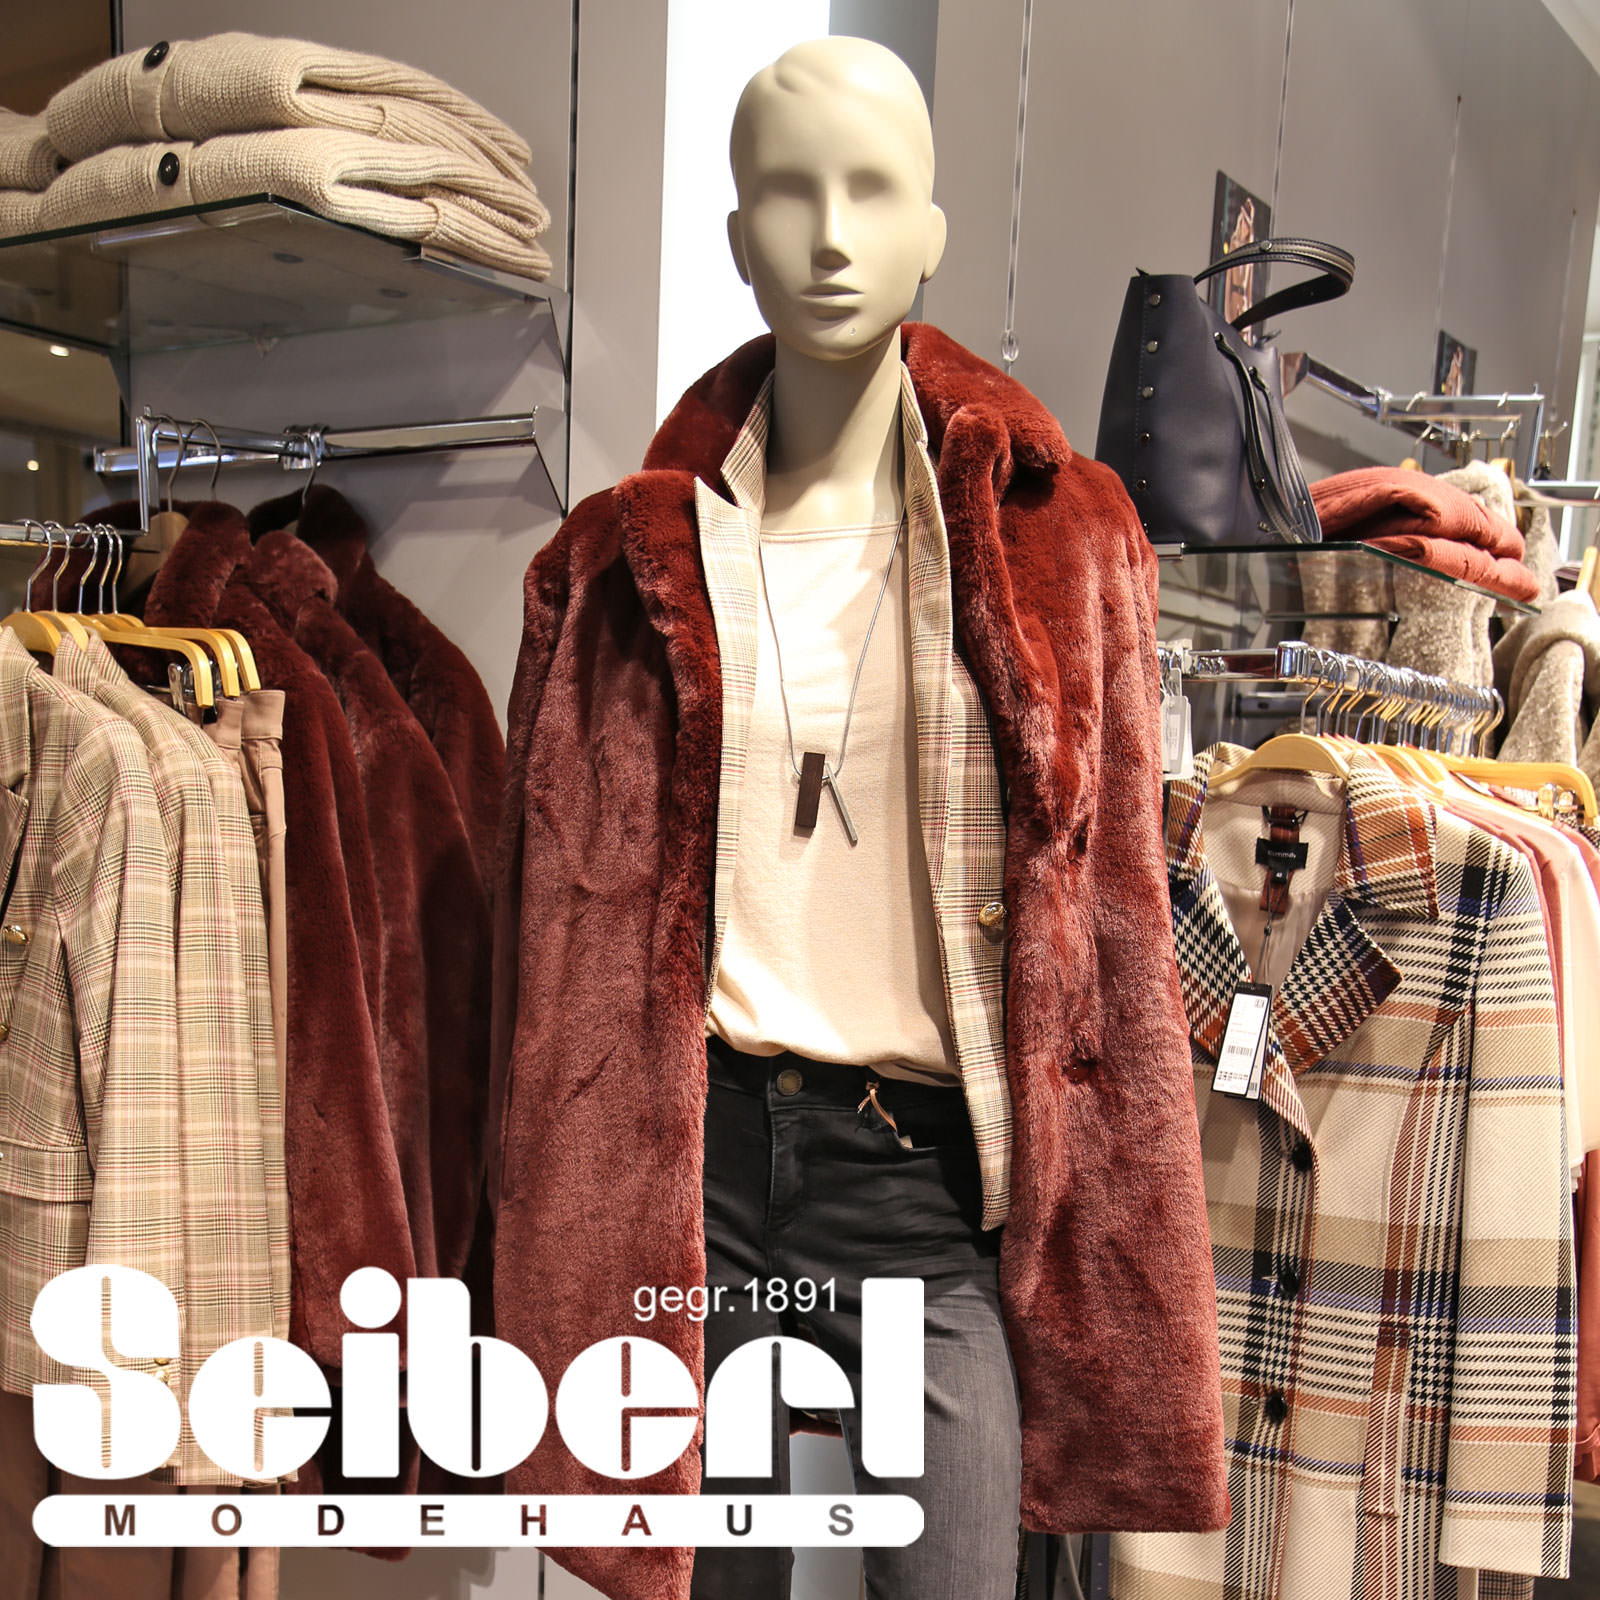 Modehaus Seiberl